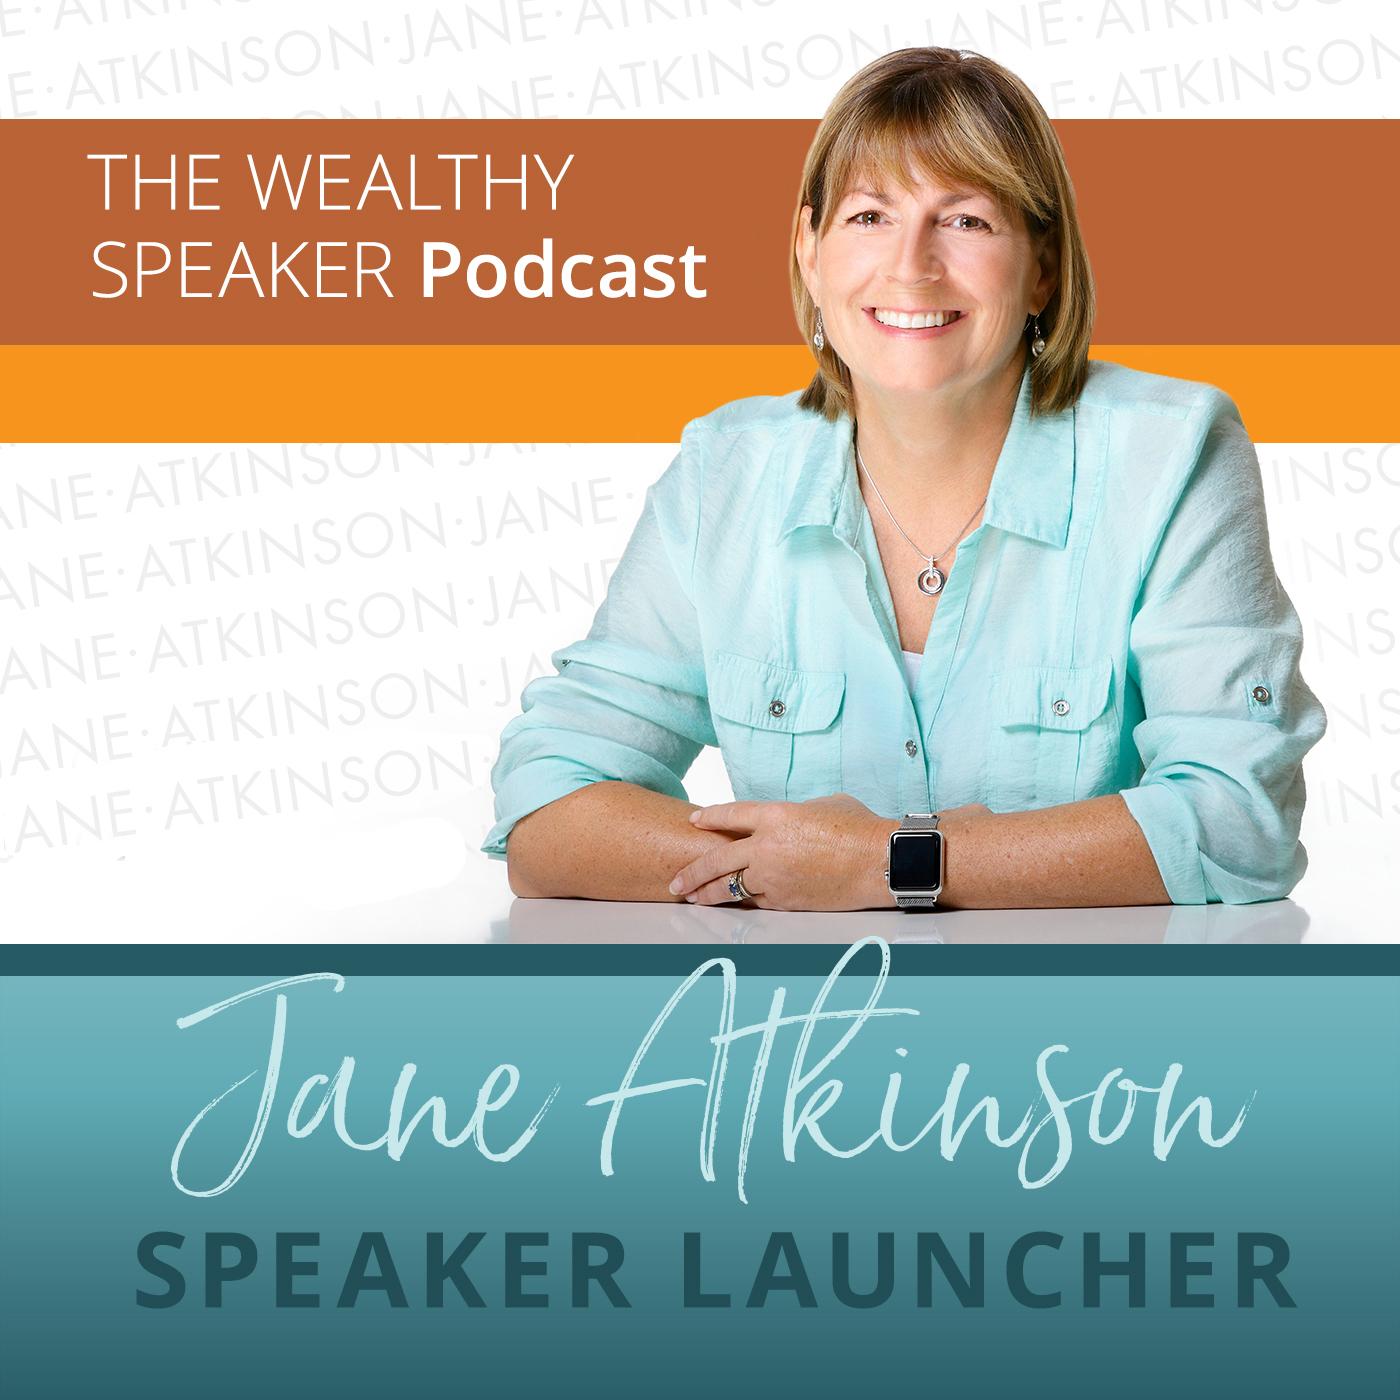 Jane Atkinson's Wealthy Speaker Podcast